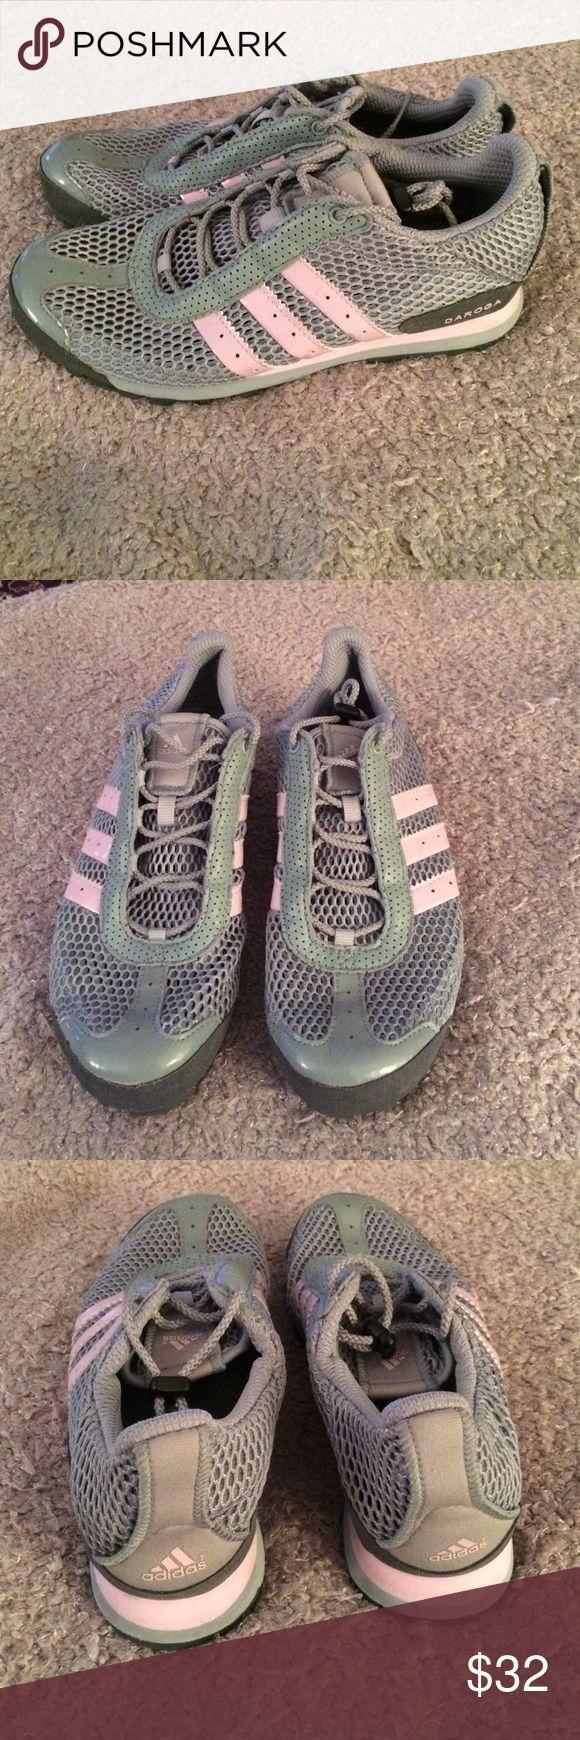 Adidas Daroga Adidas Daroga- never worn Adidas Shoes Sneakers